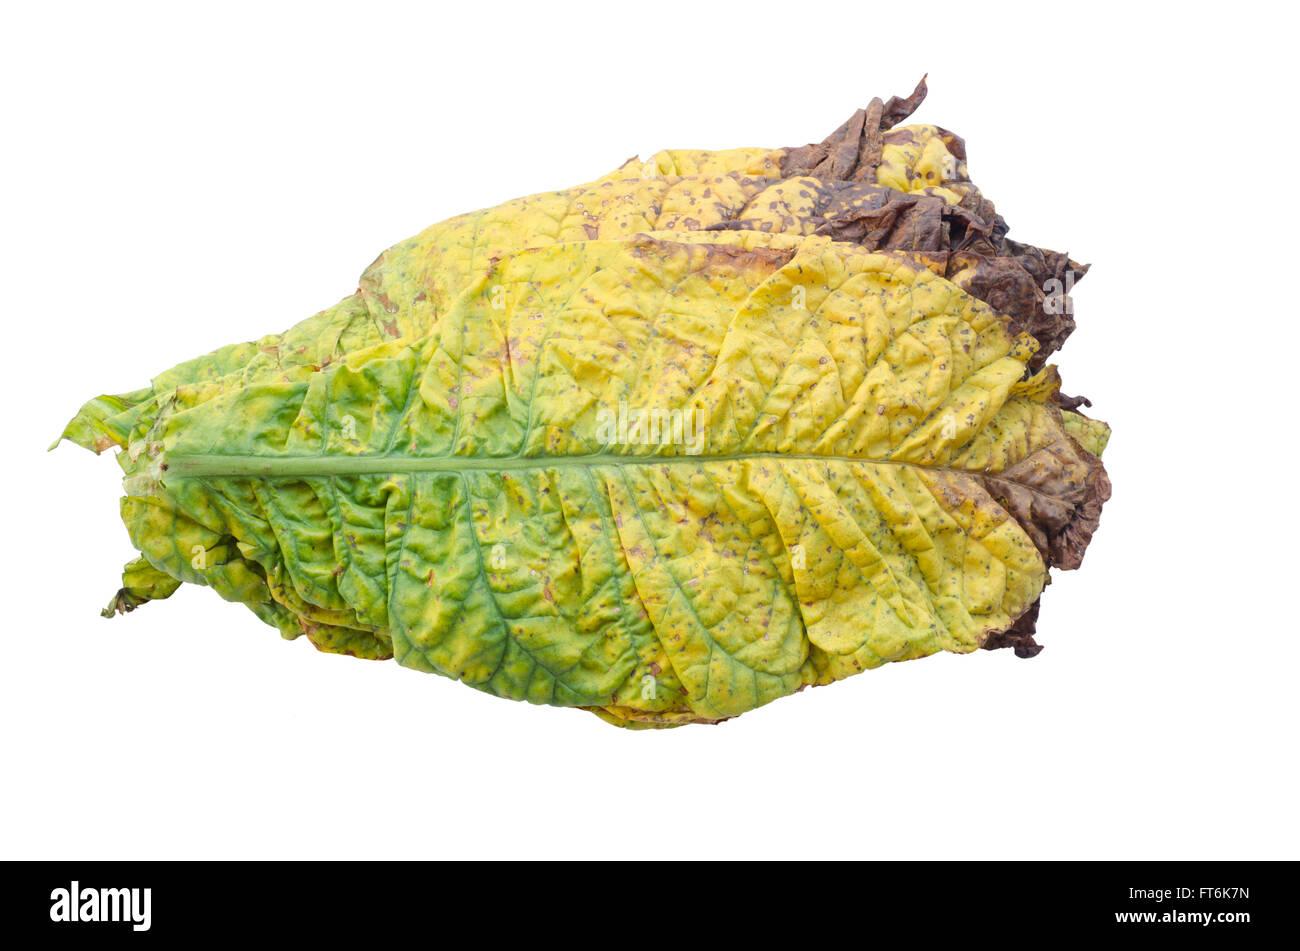 tobacco leaf isolated on white background - Stock Image